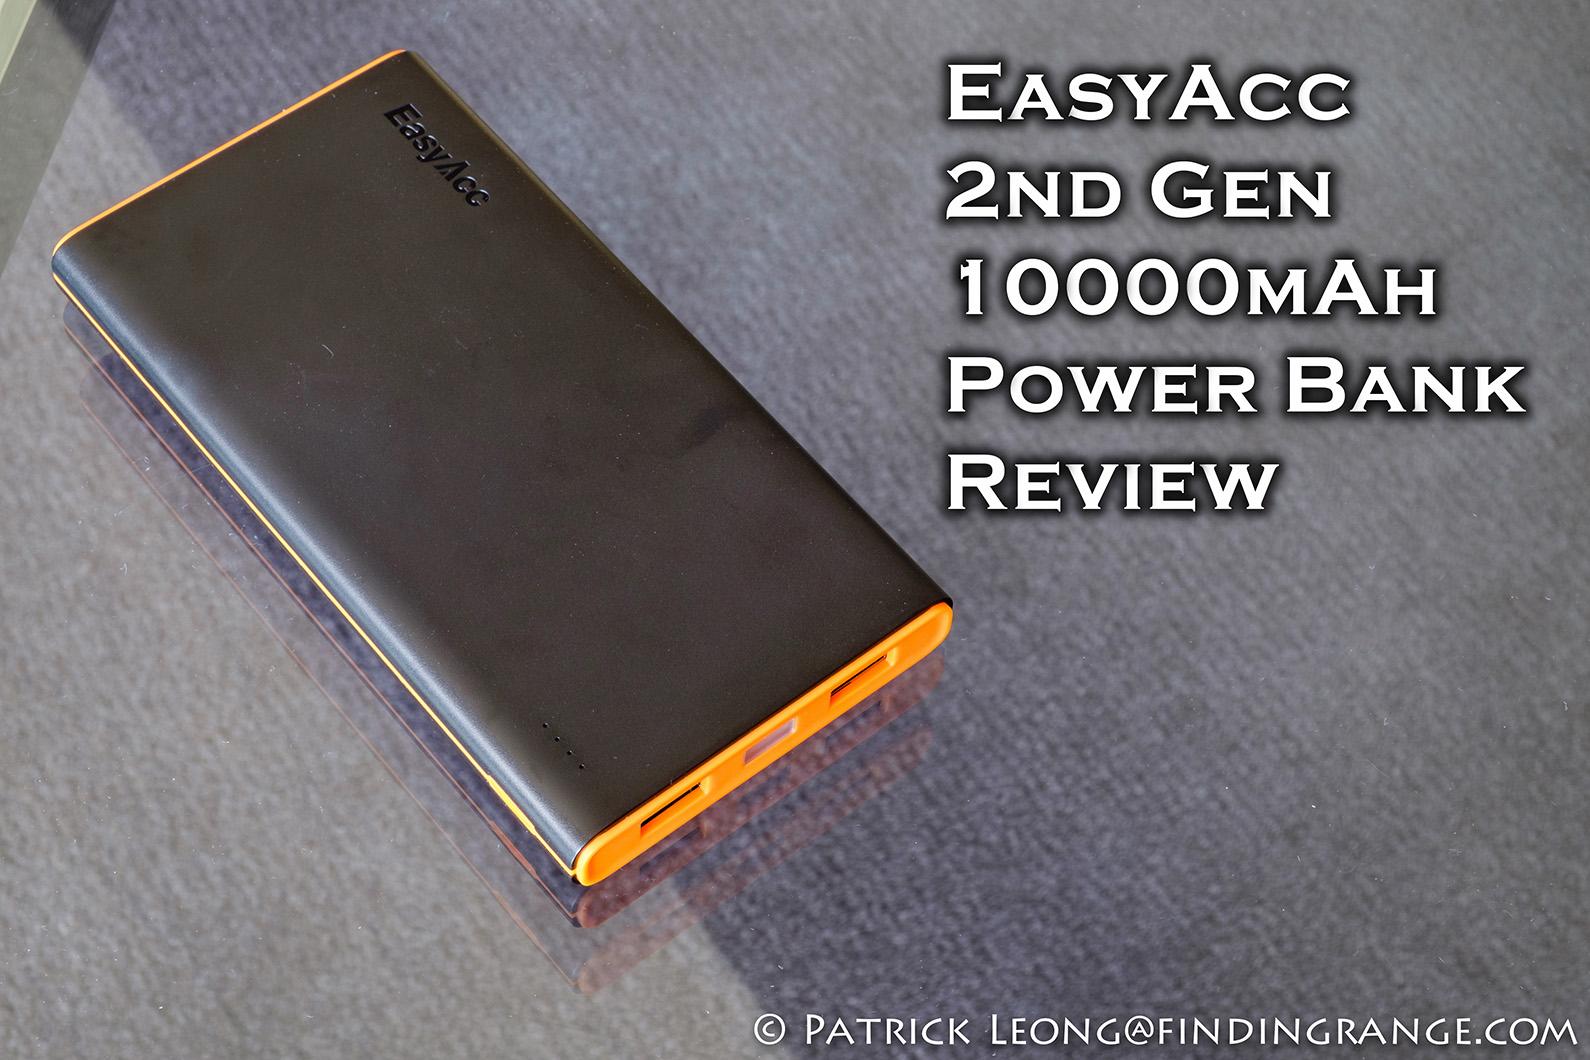 EasyAcc-2nd-Generation-10000mAh-Power-Bank-Review-1 copy